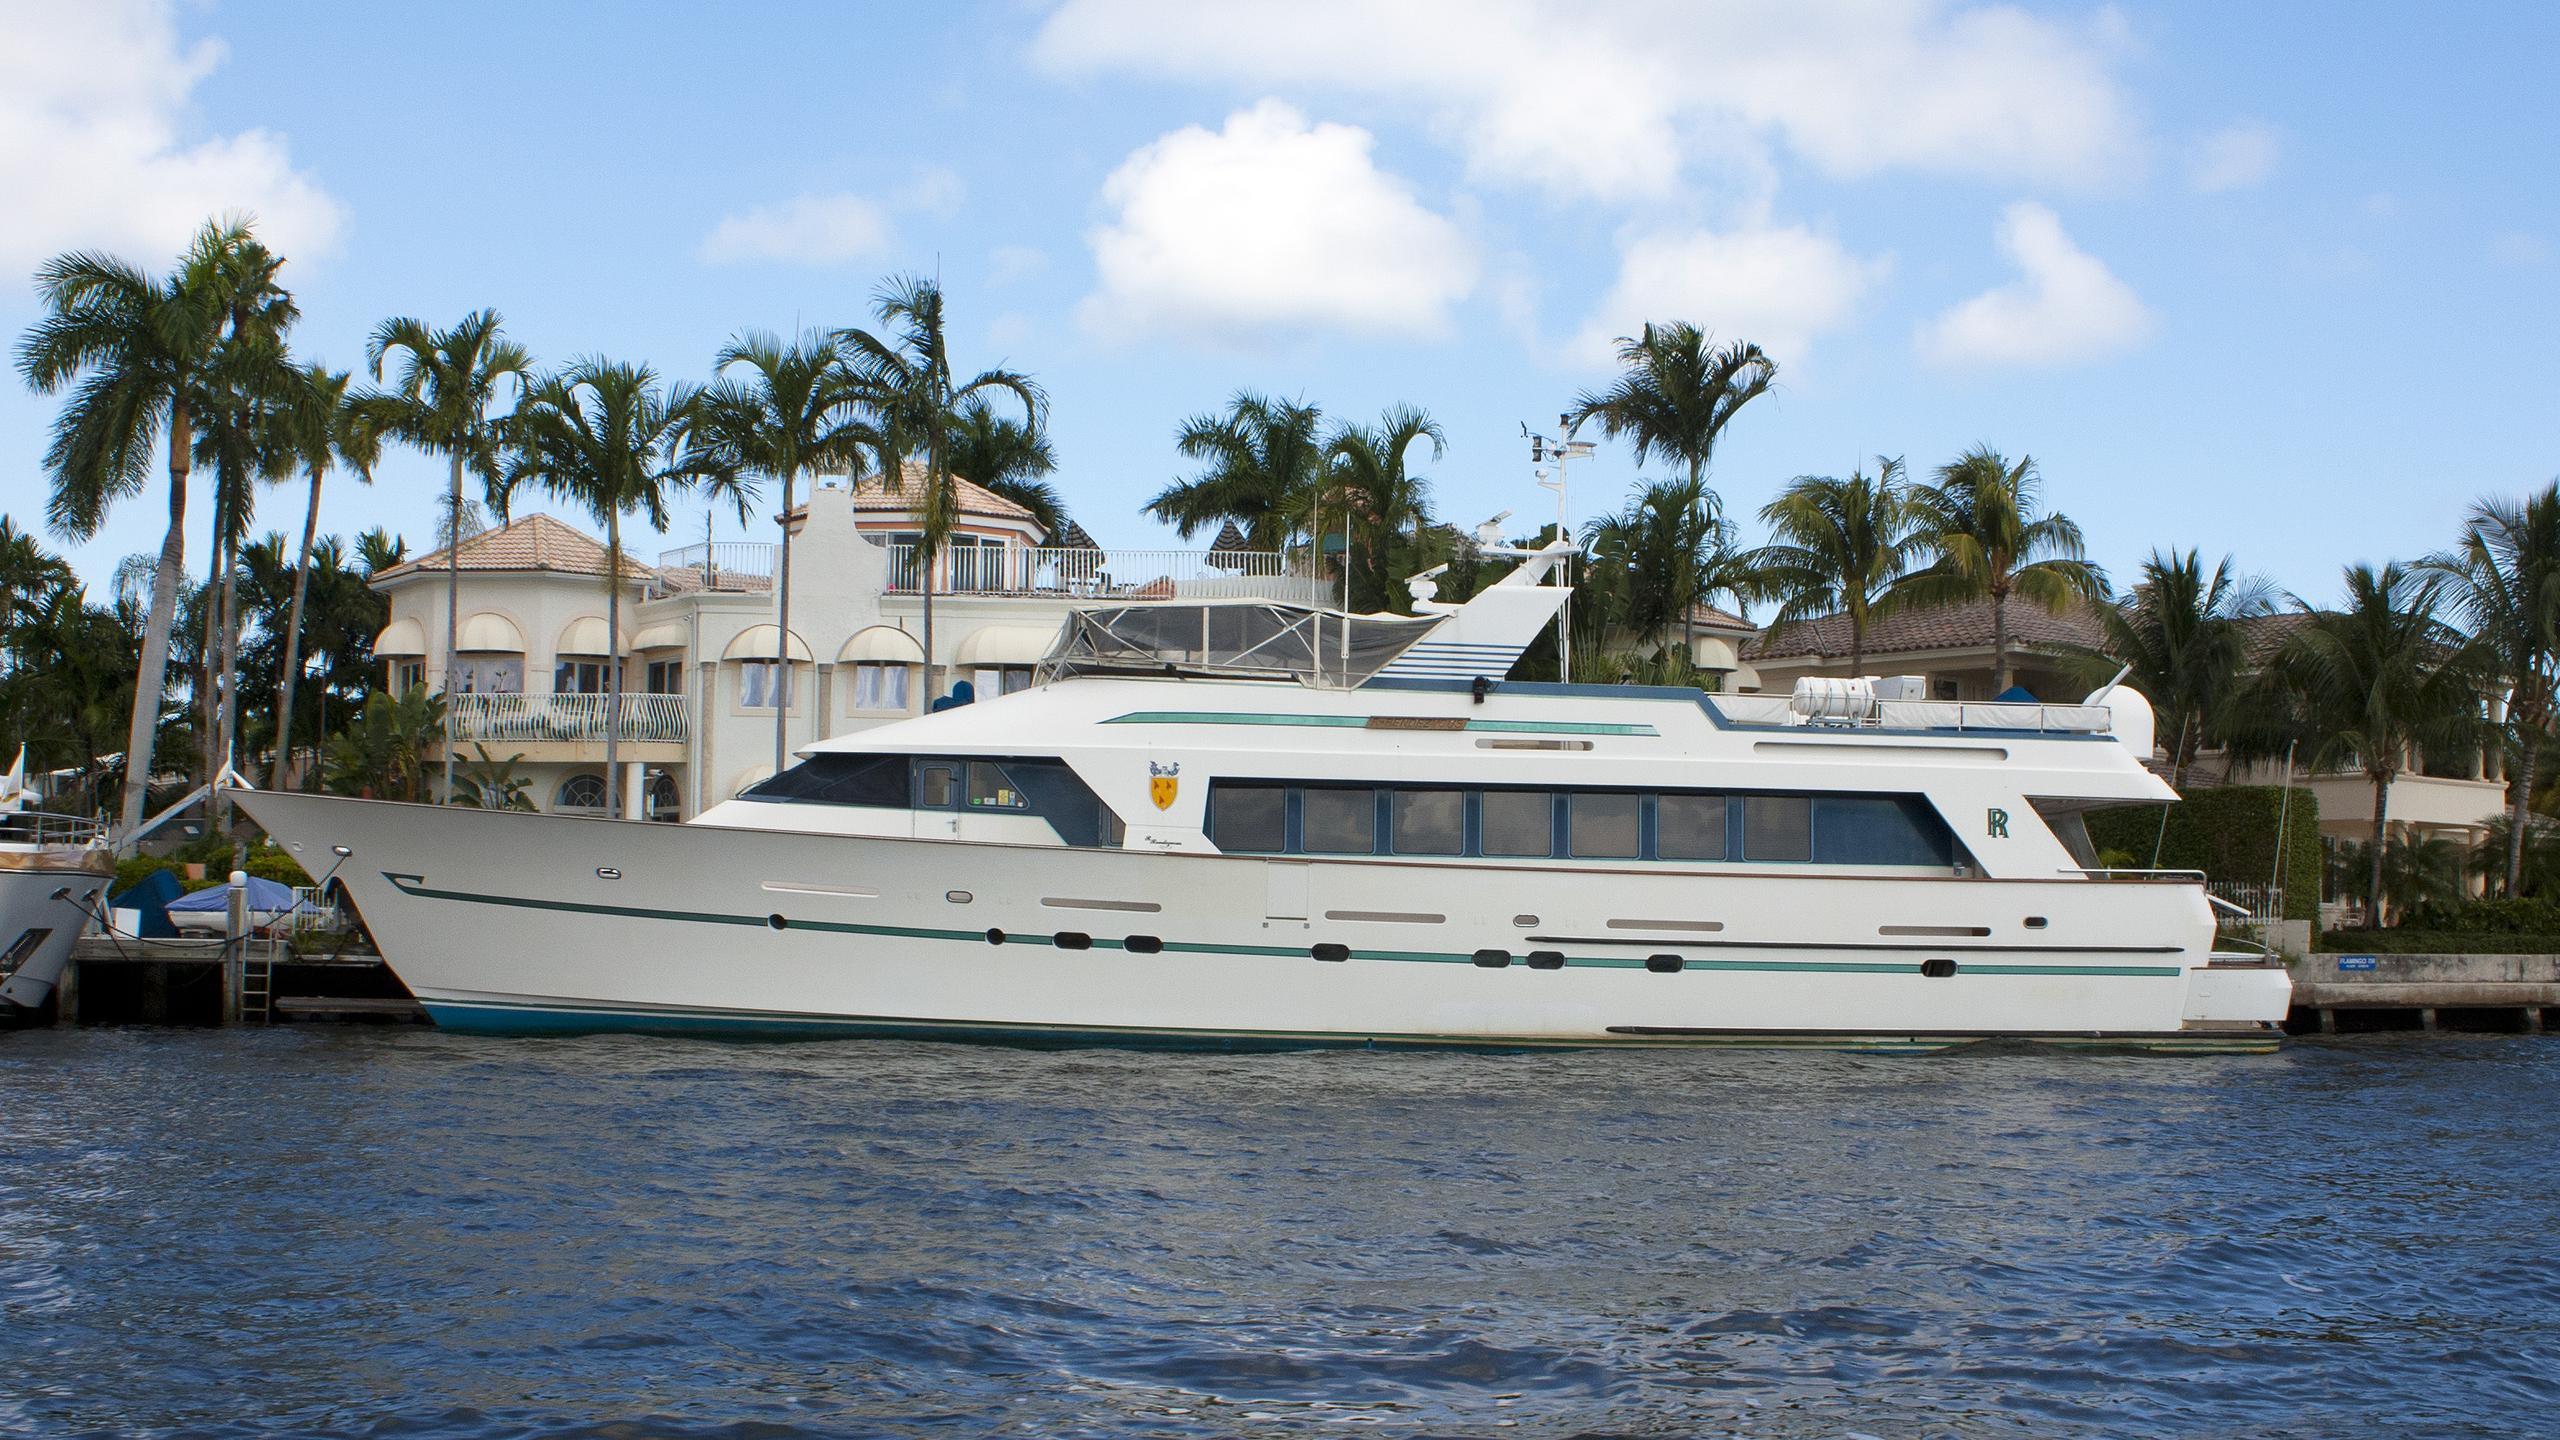 r-rendezvous-motor-yacht-christensen-1991-34m-profile